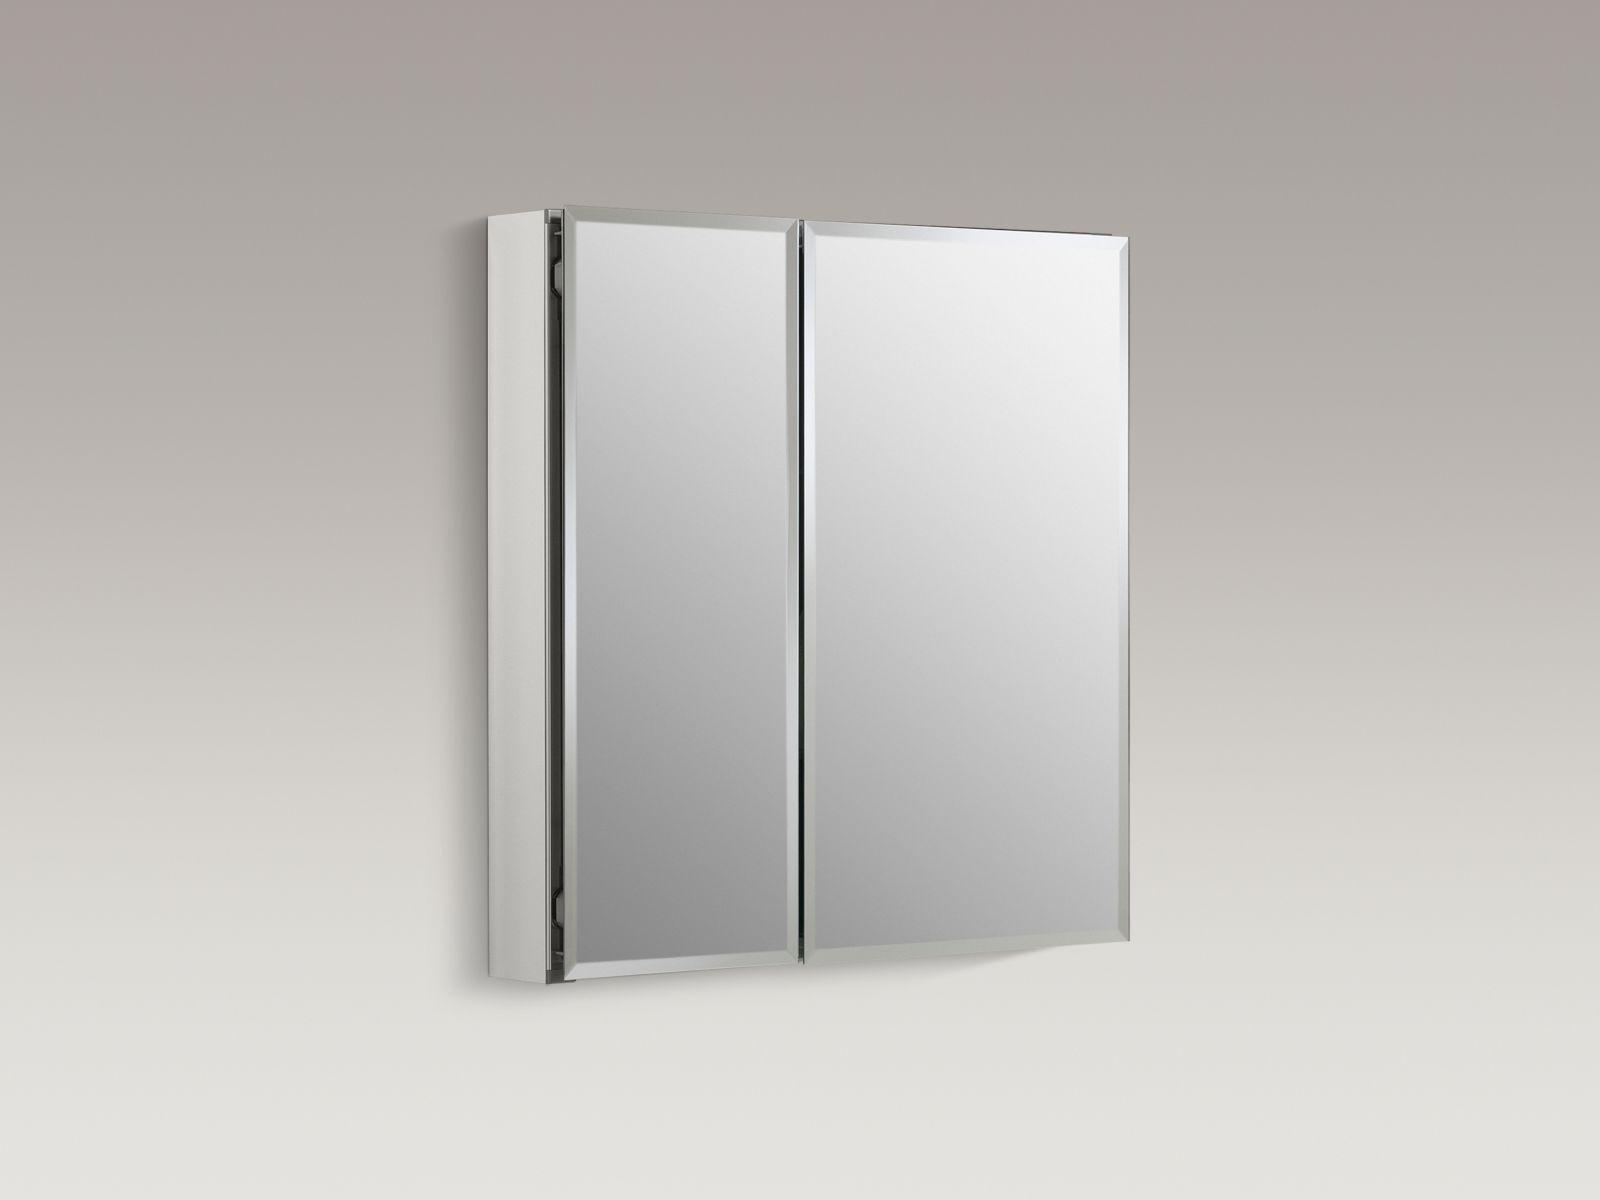 "Kohler K-CB-CLC2526FS Aluminum 25"" x 26"" Two-door Medicine Cabinet with Square Mirrored Doors"